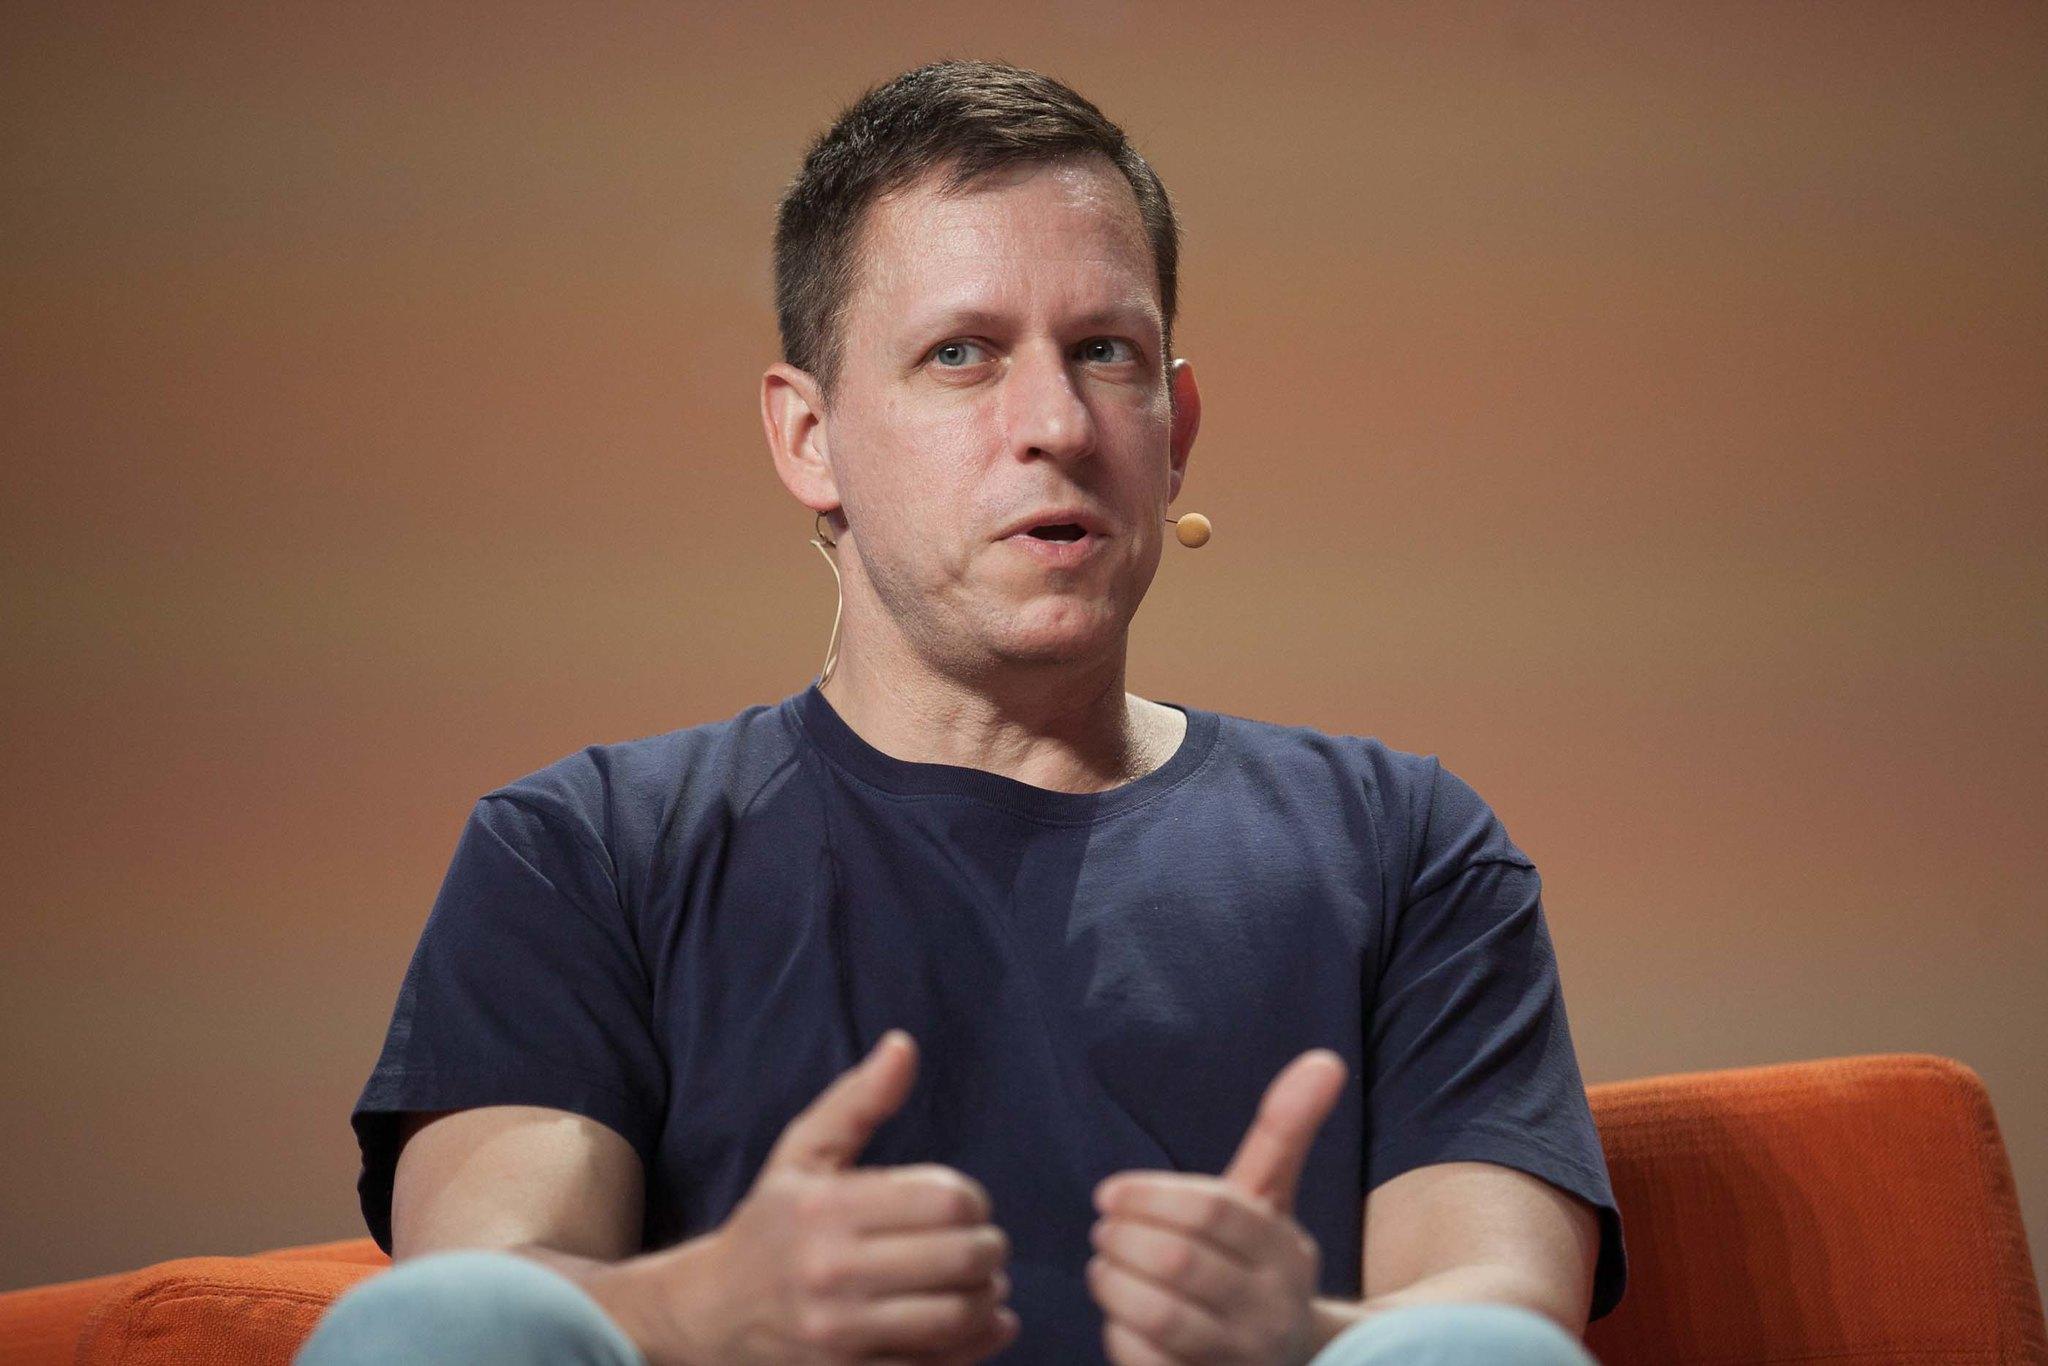 Peter Thiel loves power laws